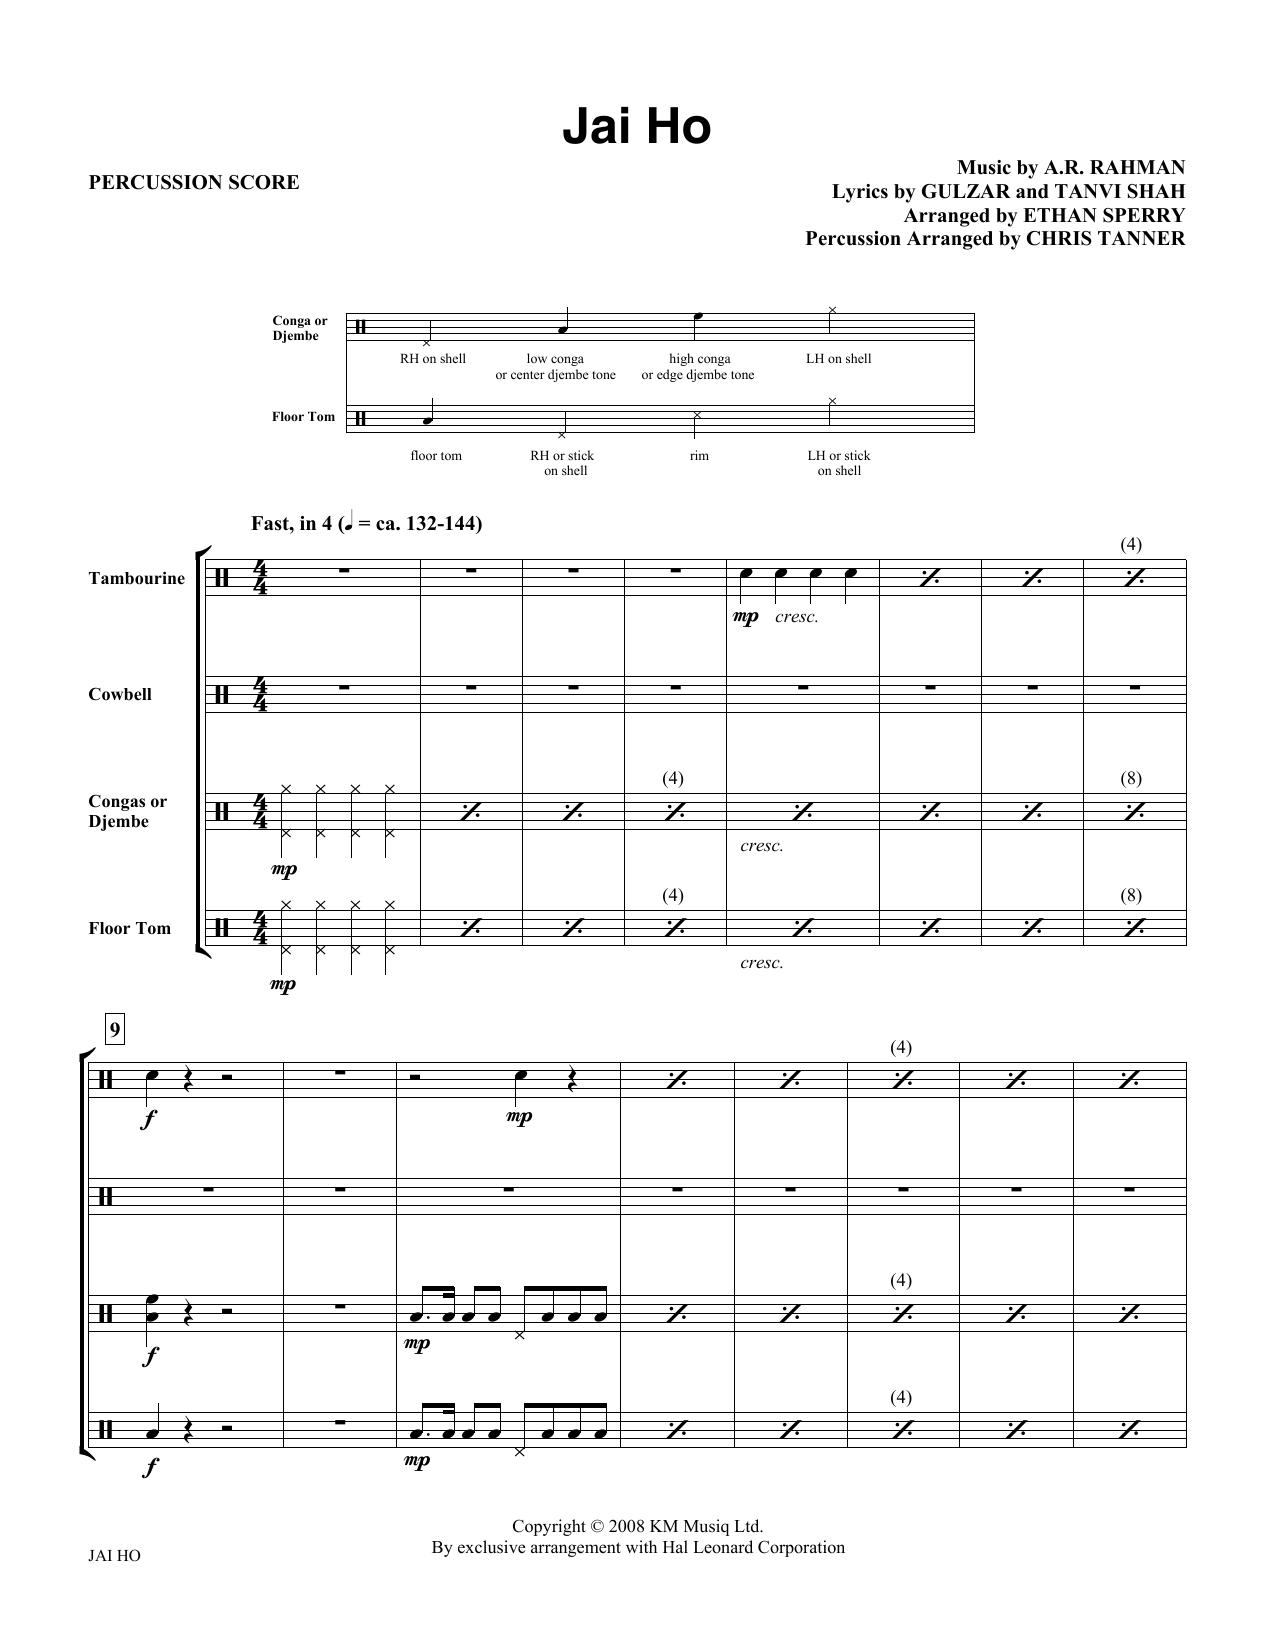 A R Rahman & The Pussycat Dolls featuring Nicole Scherzinger - Jai Ho - Score